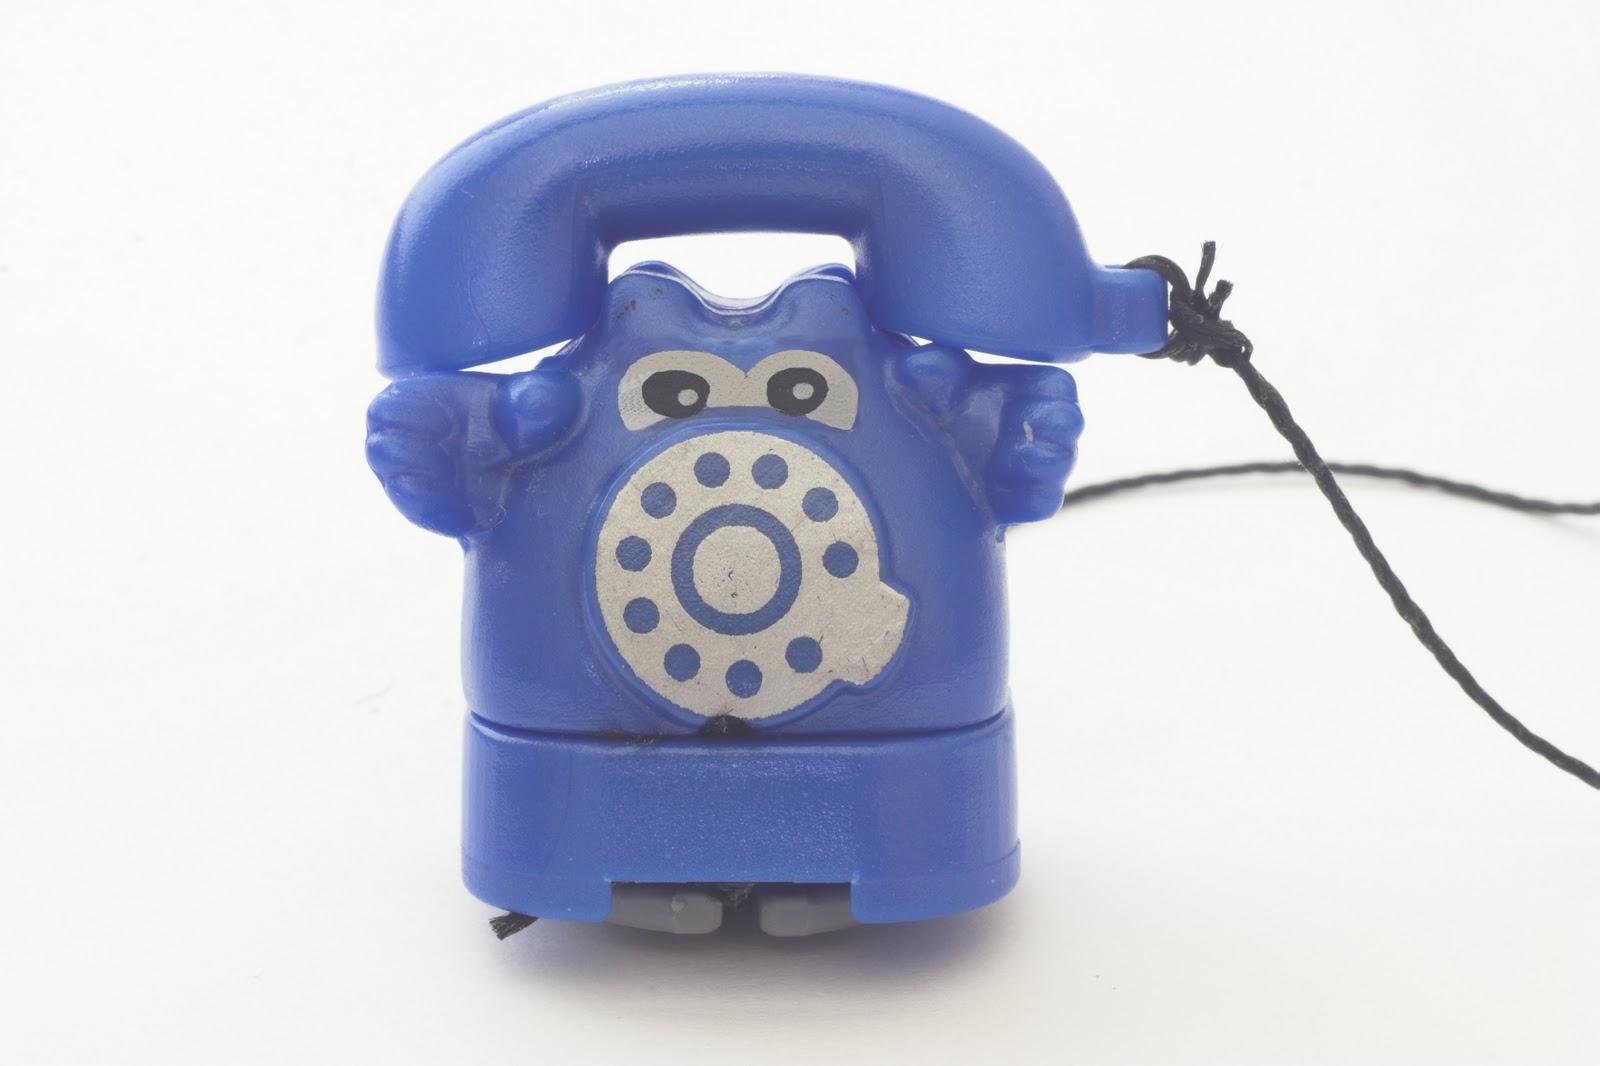 http://3.bp.blogspot.com/-BwAzy_aU0co/TZF-htM03CI/AAAAAAAAAOE/d74Soshb_lg/s1600/blue+phone.jpg